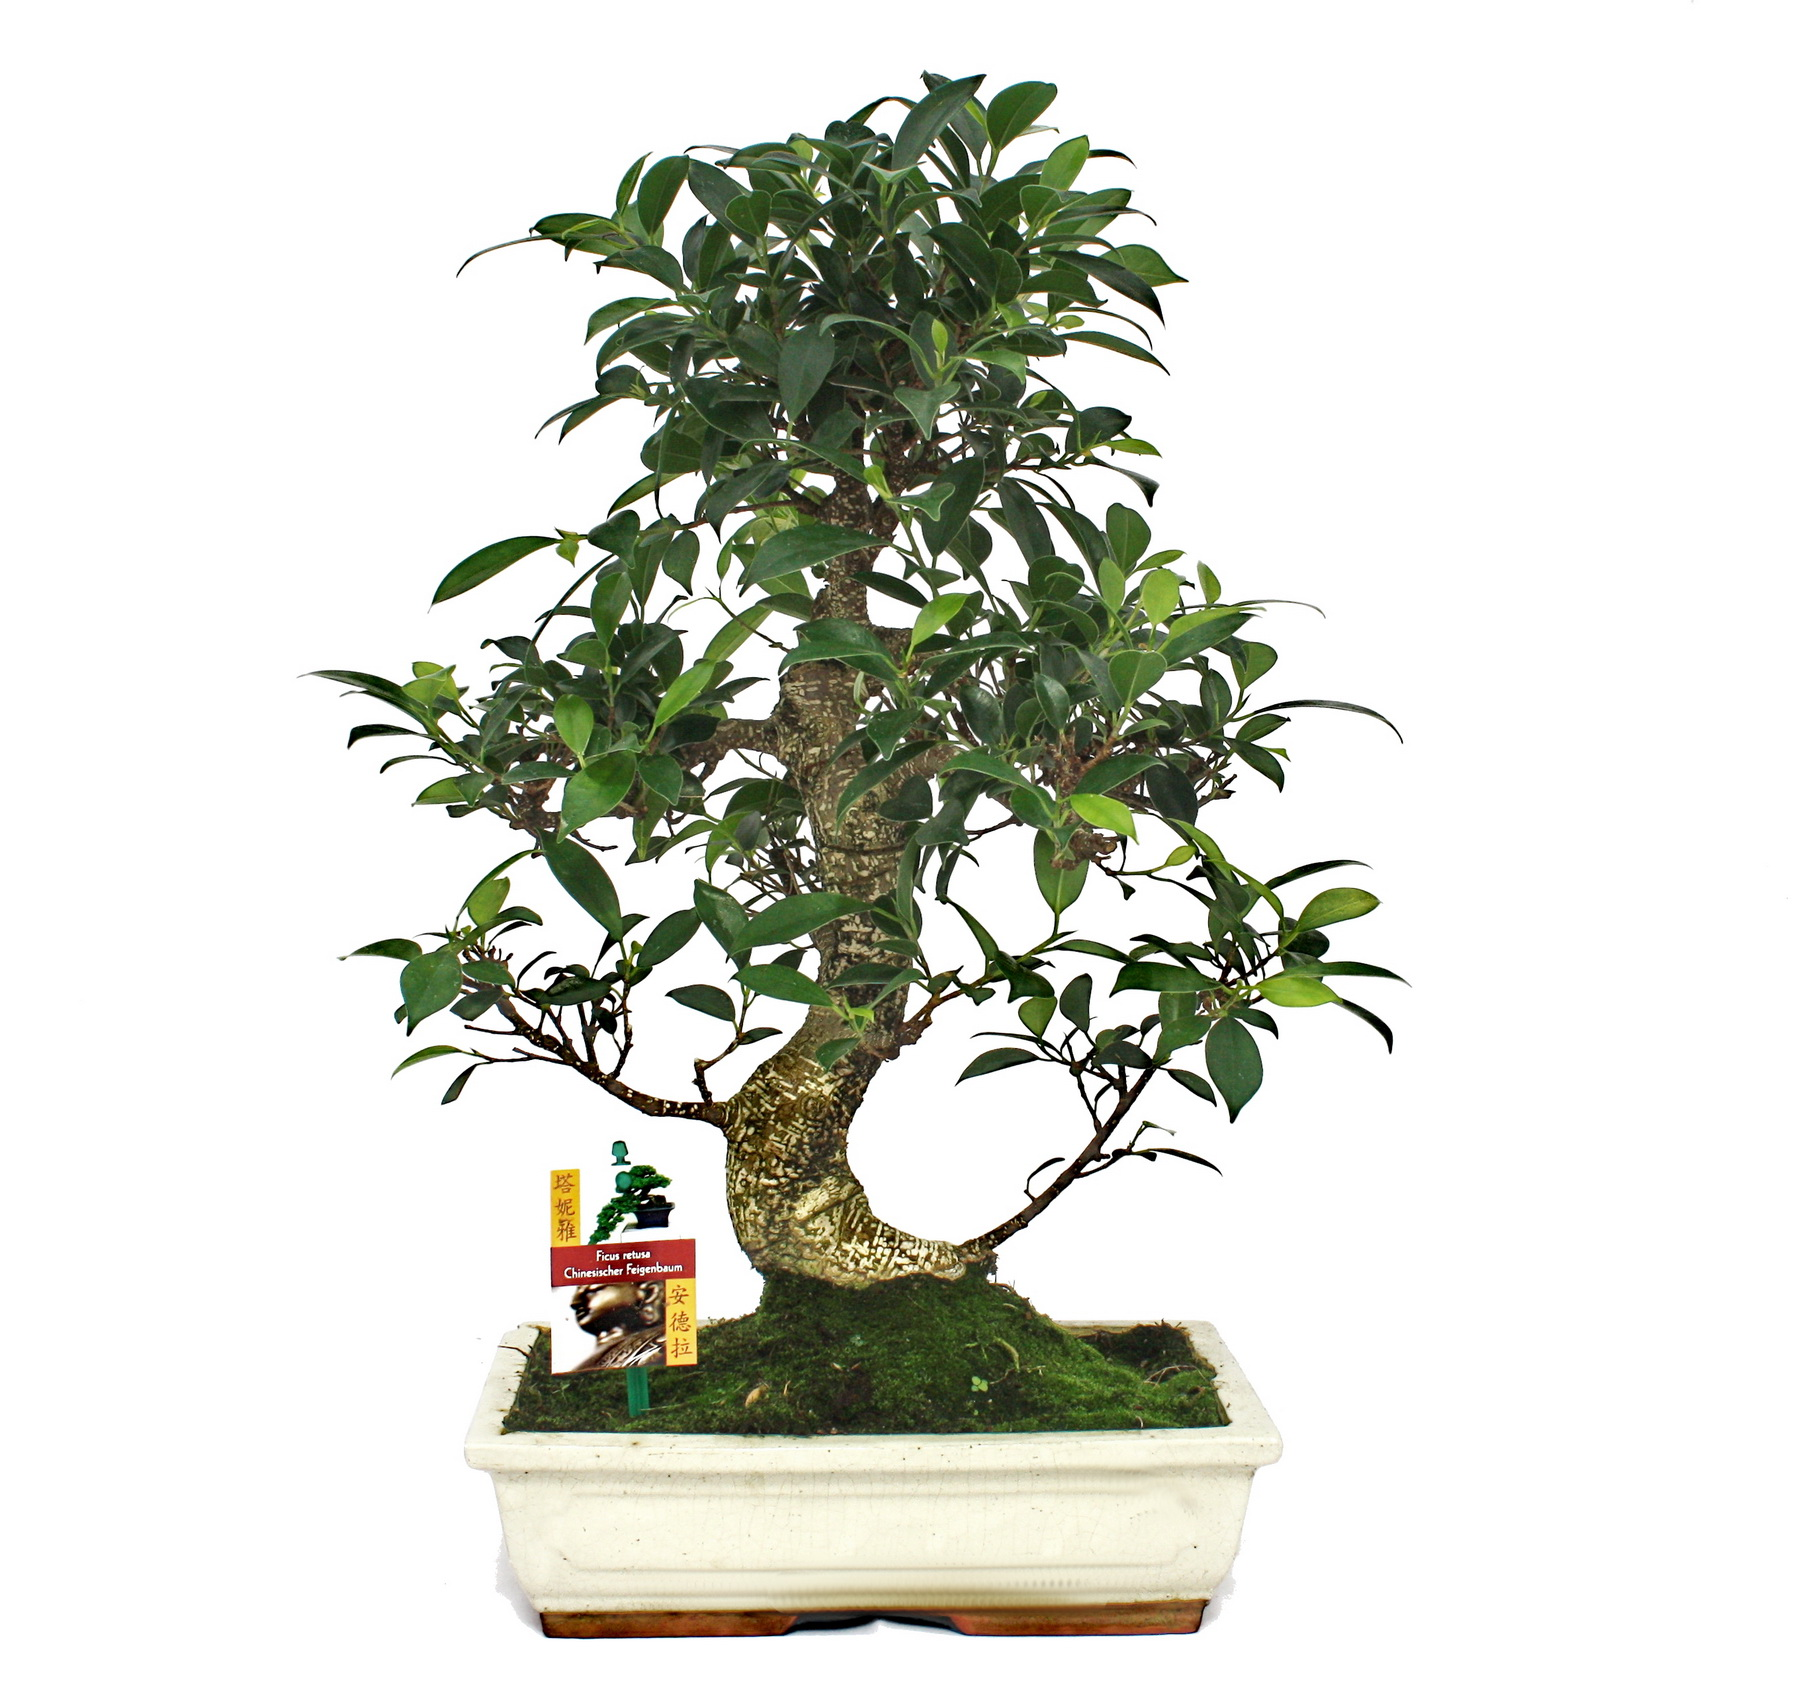 bonsai chinesischer feigenbaum ficus retusa ca 12 15 jahre ebay. Black Bedroom Furniture Sets. Home Design Ideas